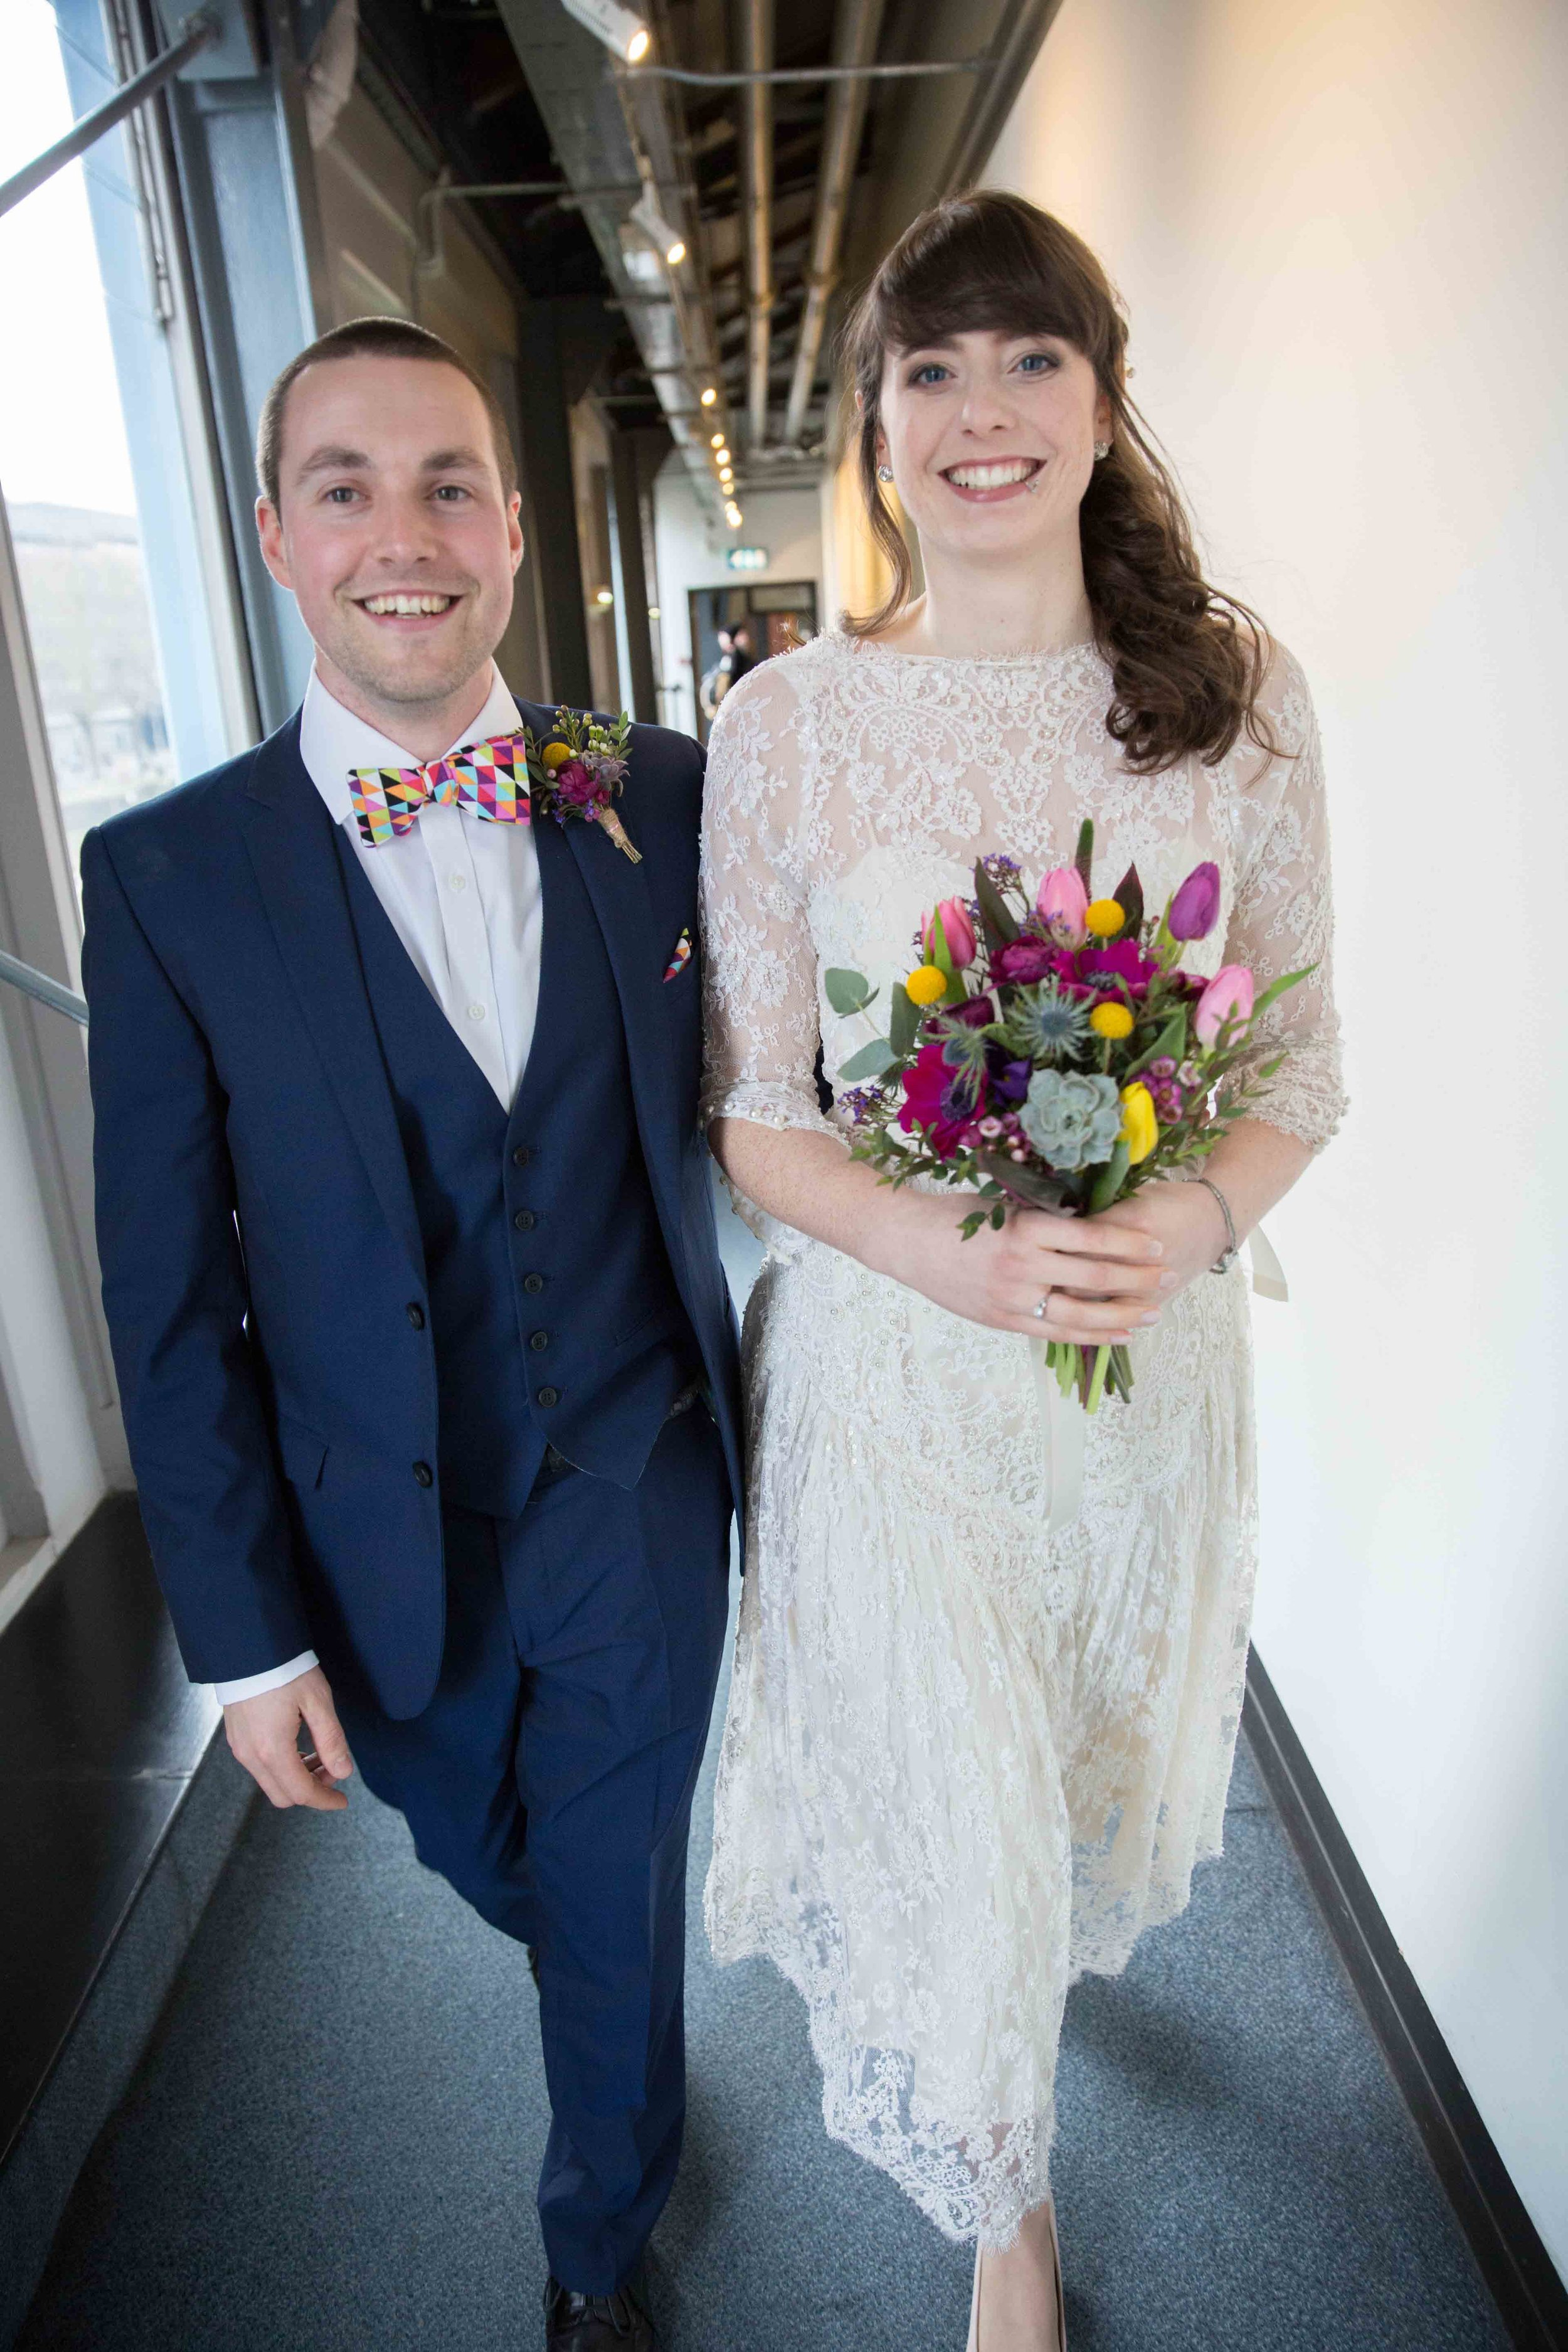 Adam & Faye - Wright Wedding Photography - Bristol Wedding Photographer -78.jpg